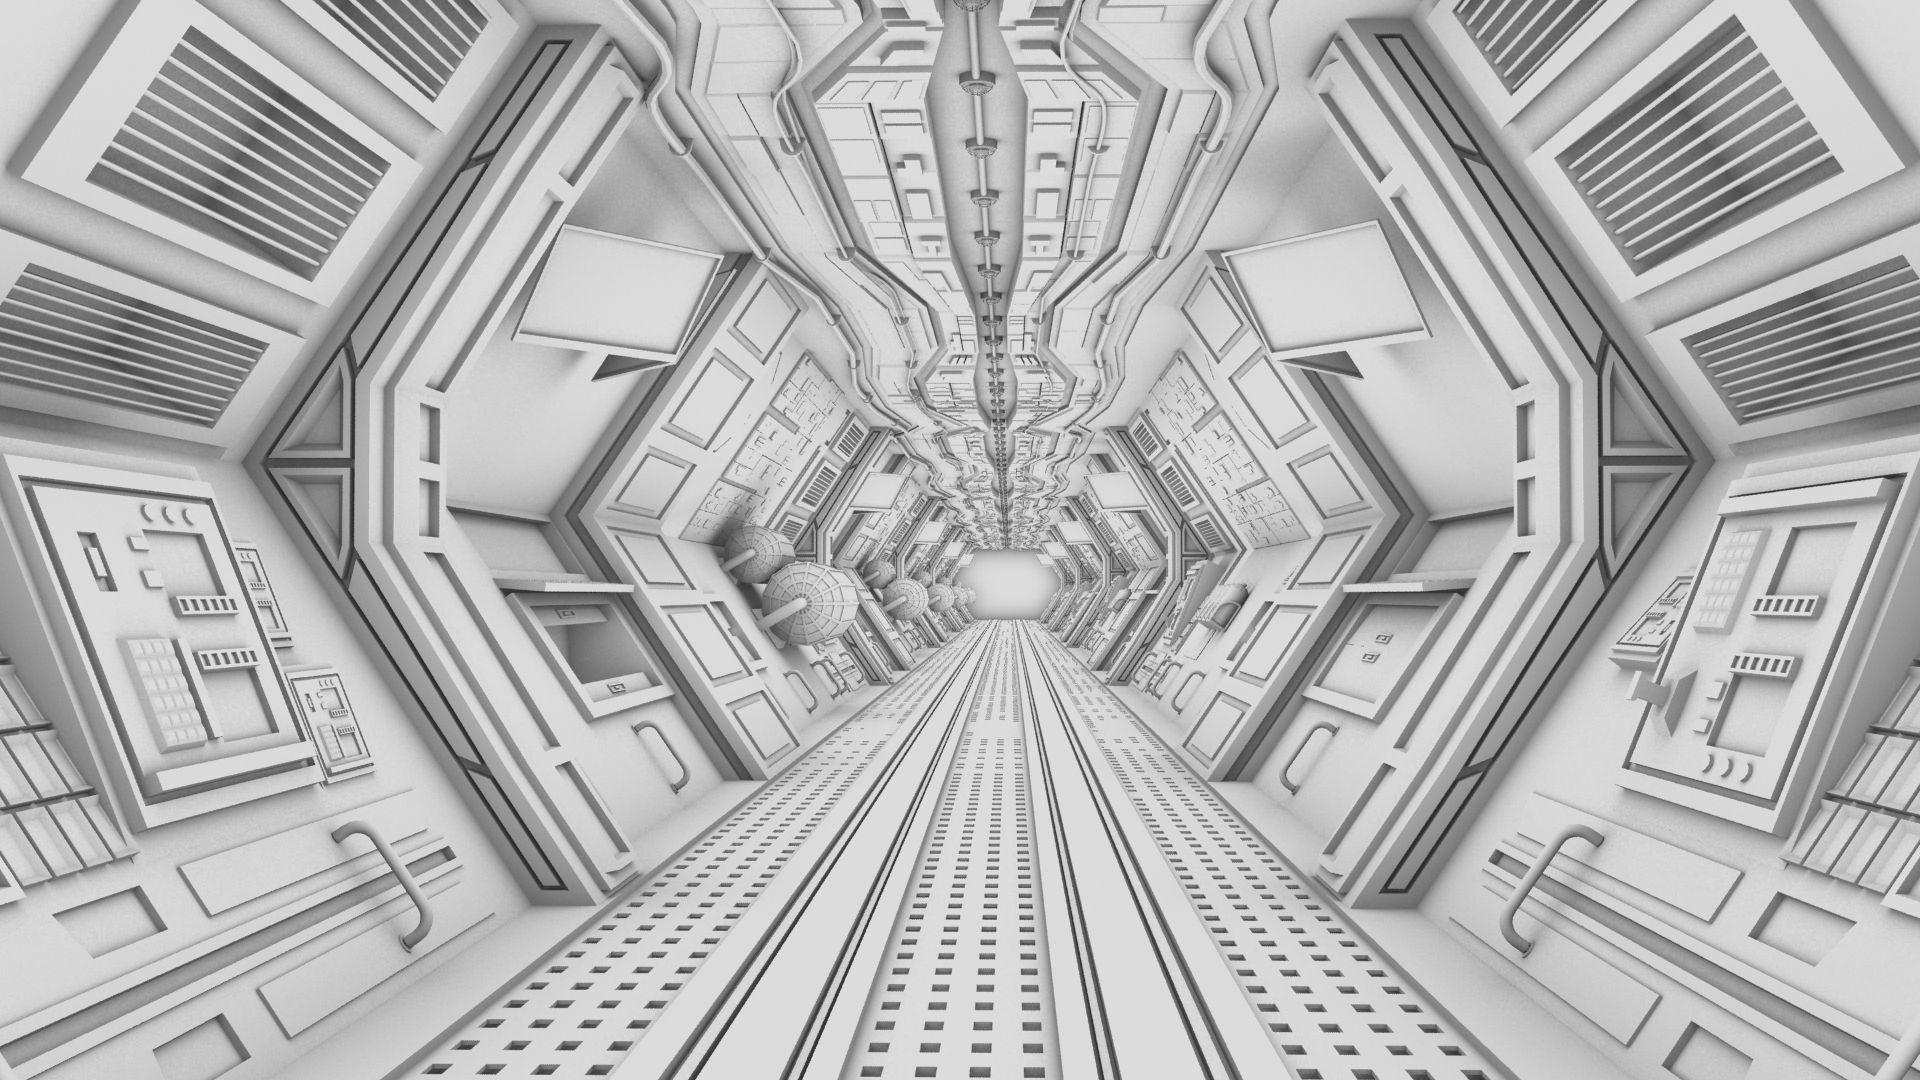 3d model spaceship corridor wip dystopiartist by for Deviantart 3d models